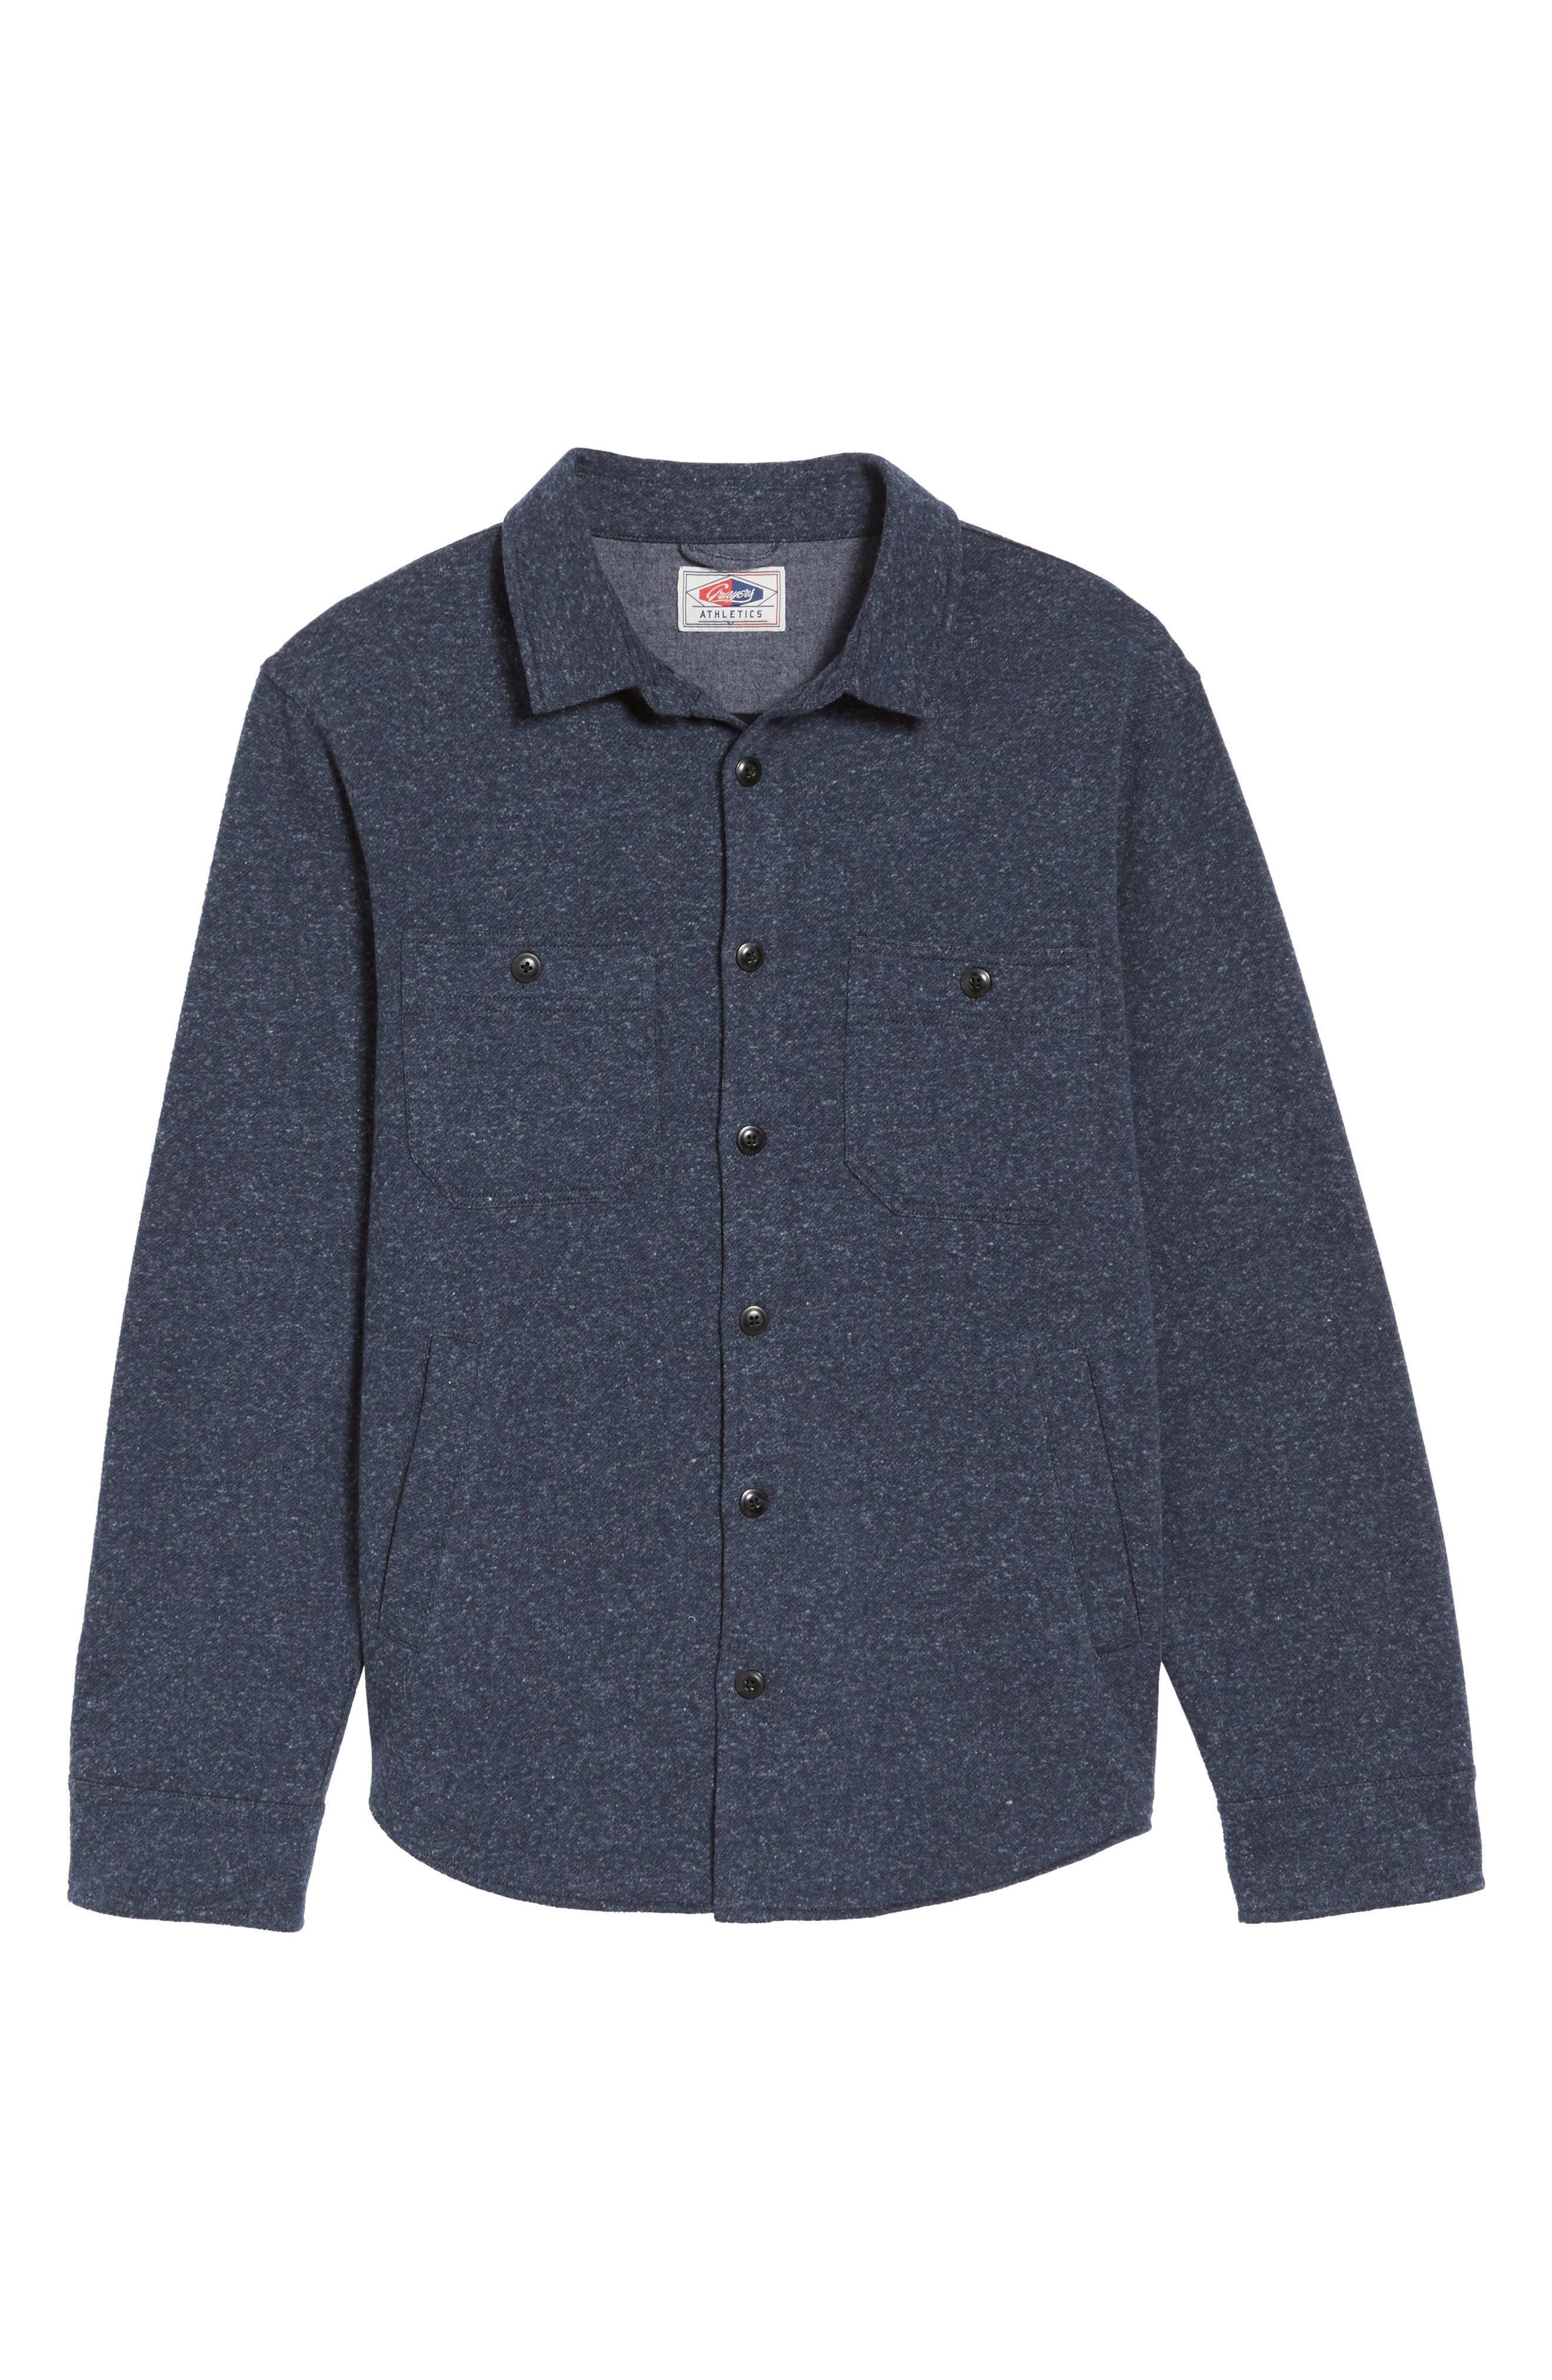 Bayswater Modern Fit Heathered Shirt Jacket,                             Alternate thumbnail 6, color,                             413